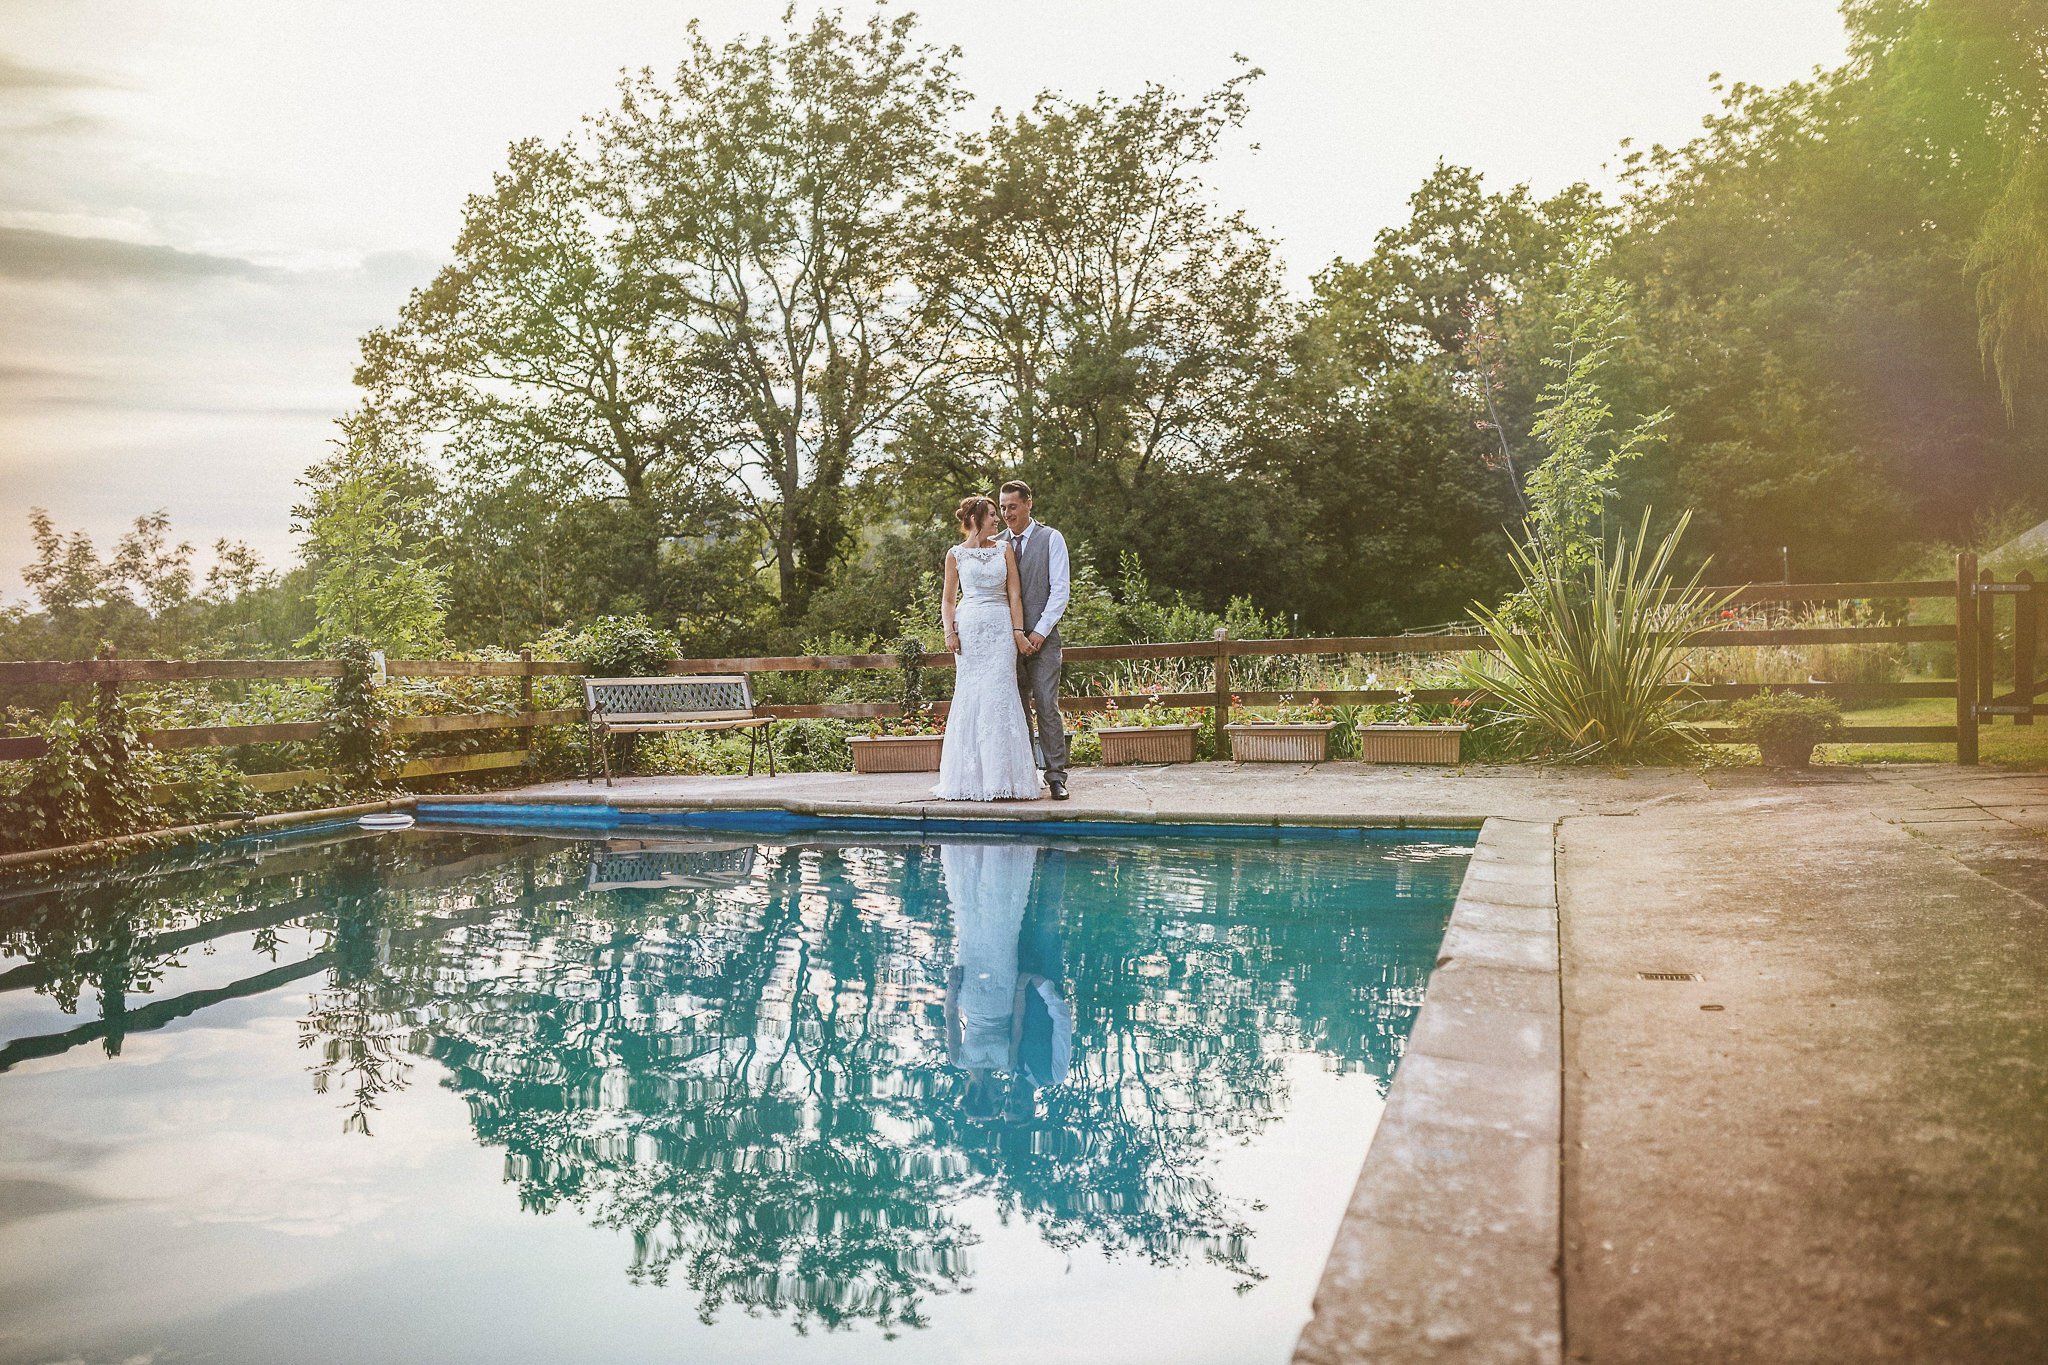 paul-marbrook-Caer-Llan-Wedding-Photographer-90090